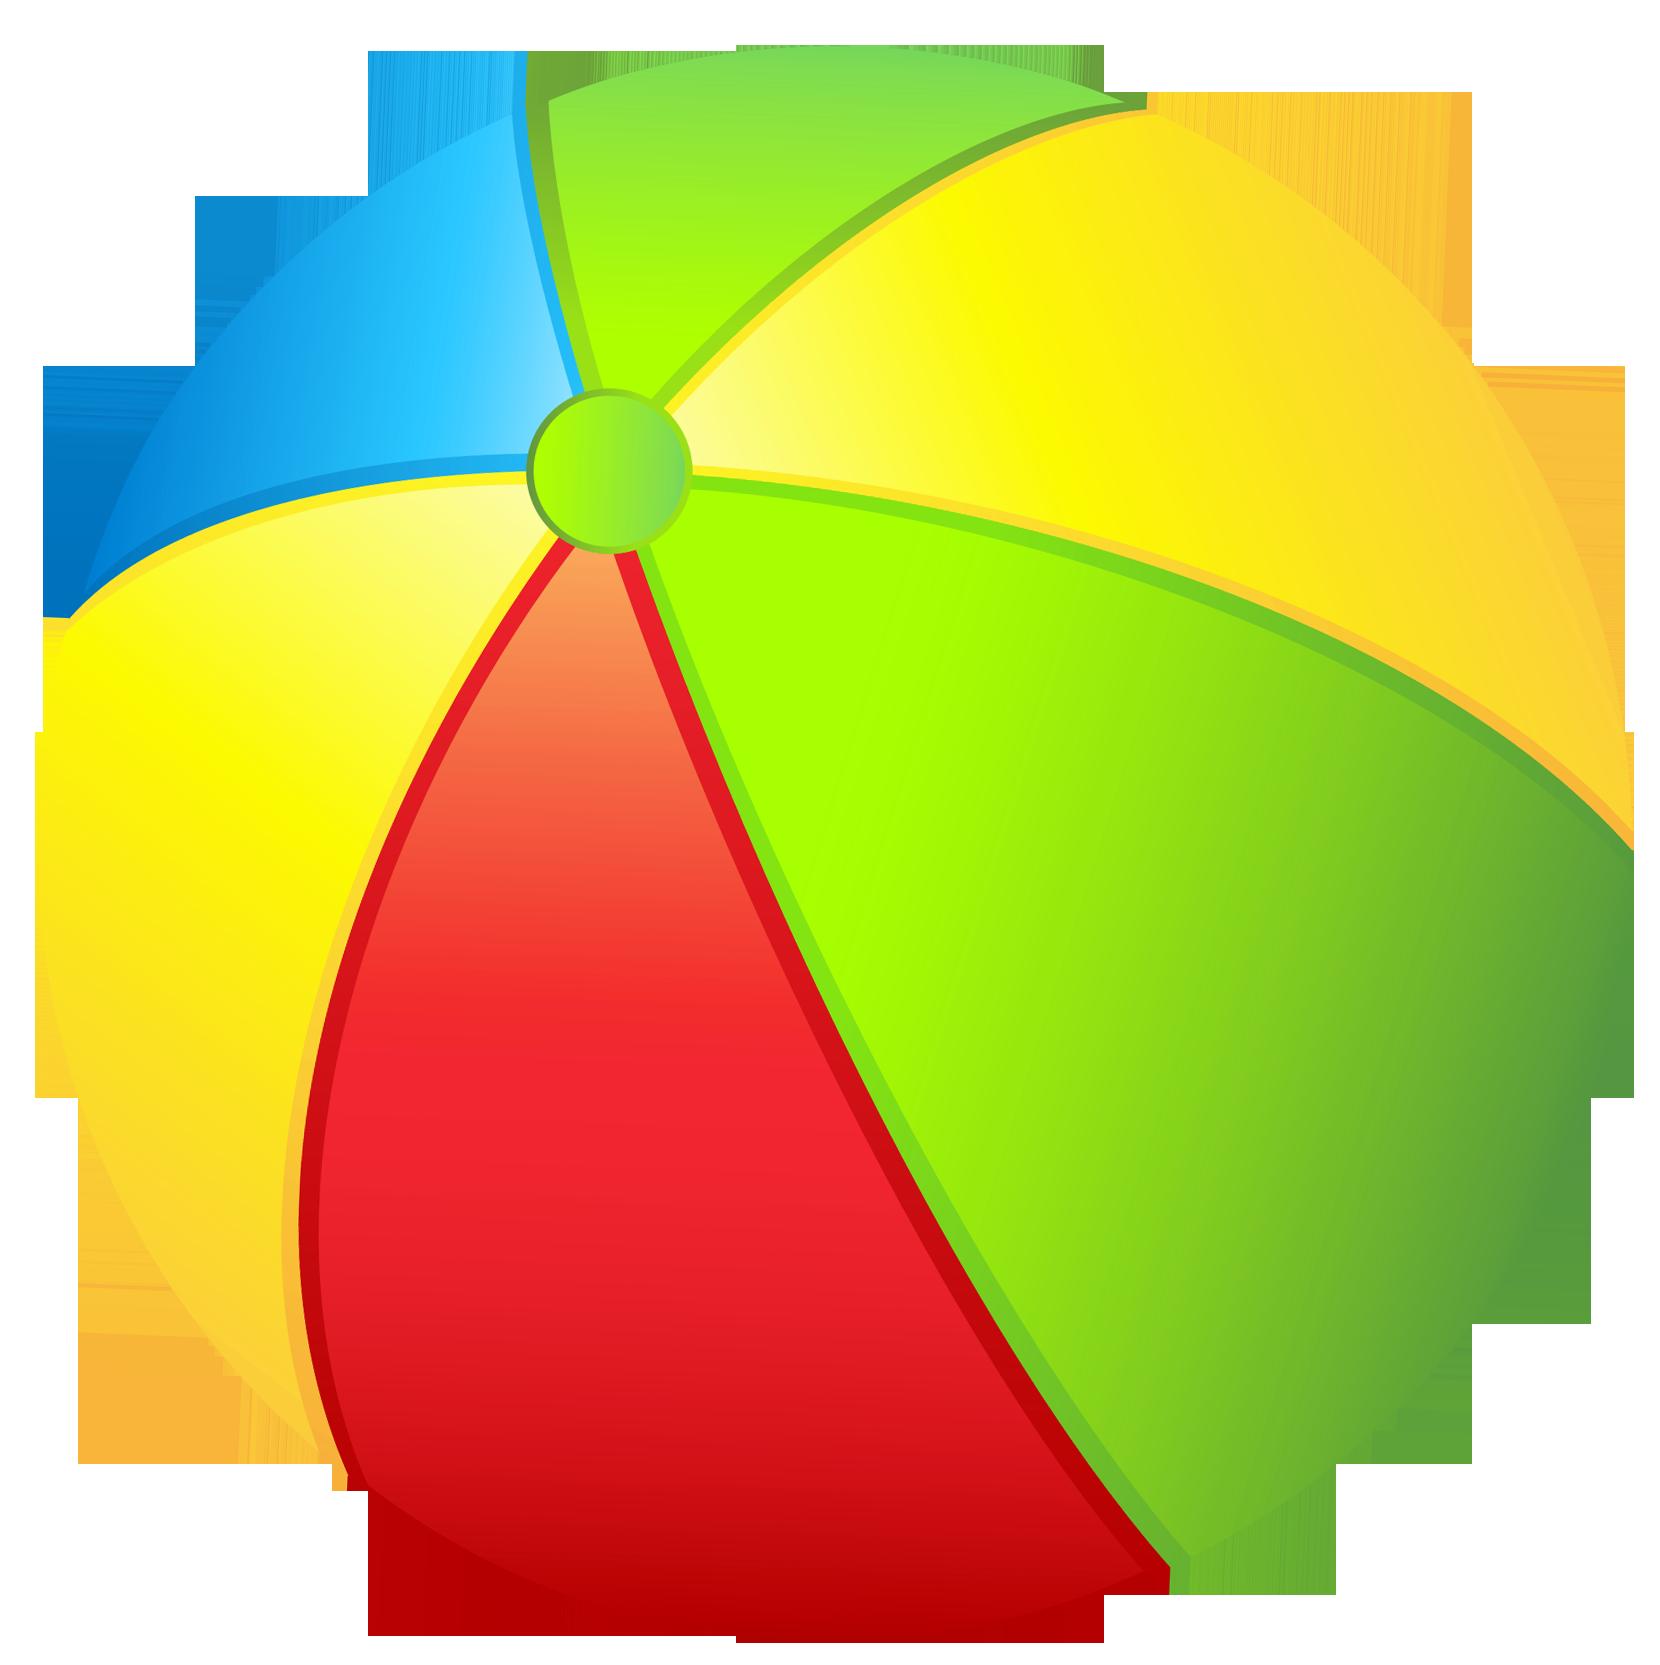 Ball Clipart-ball clipart-2